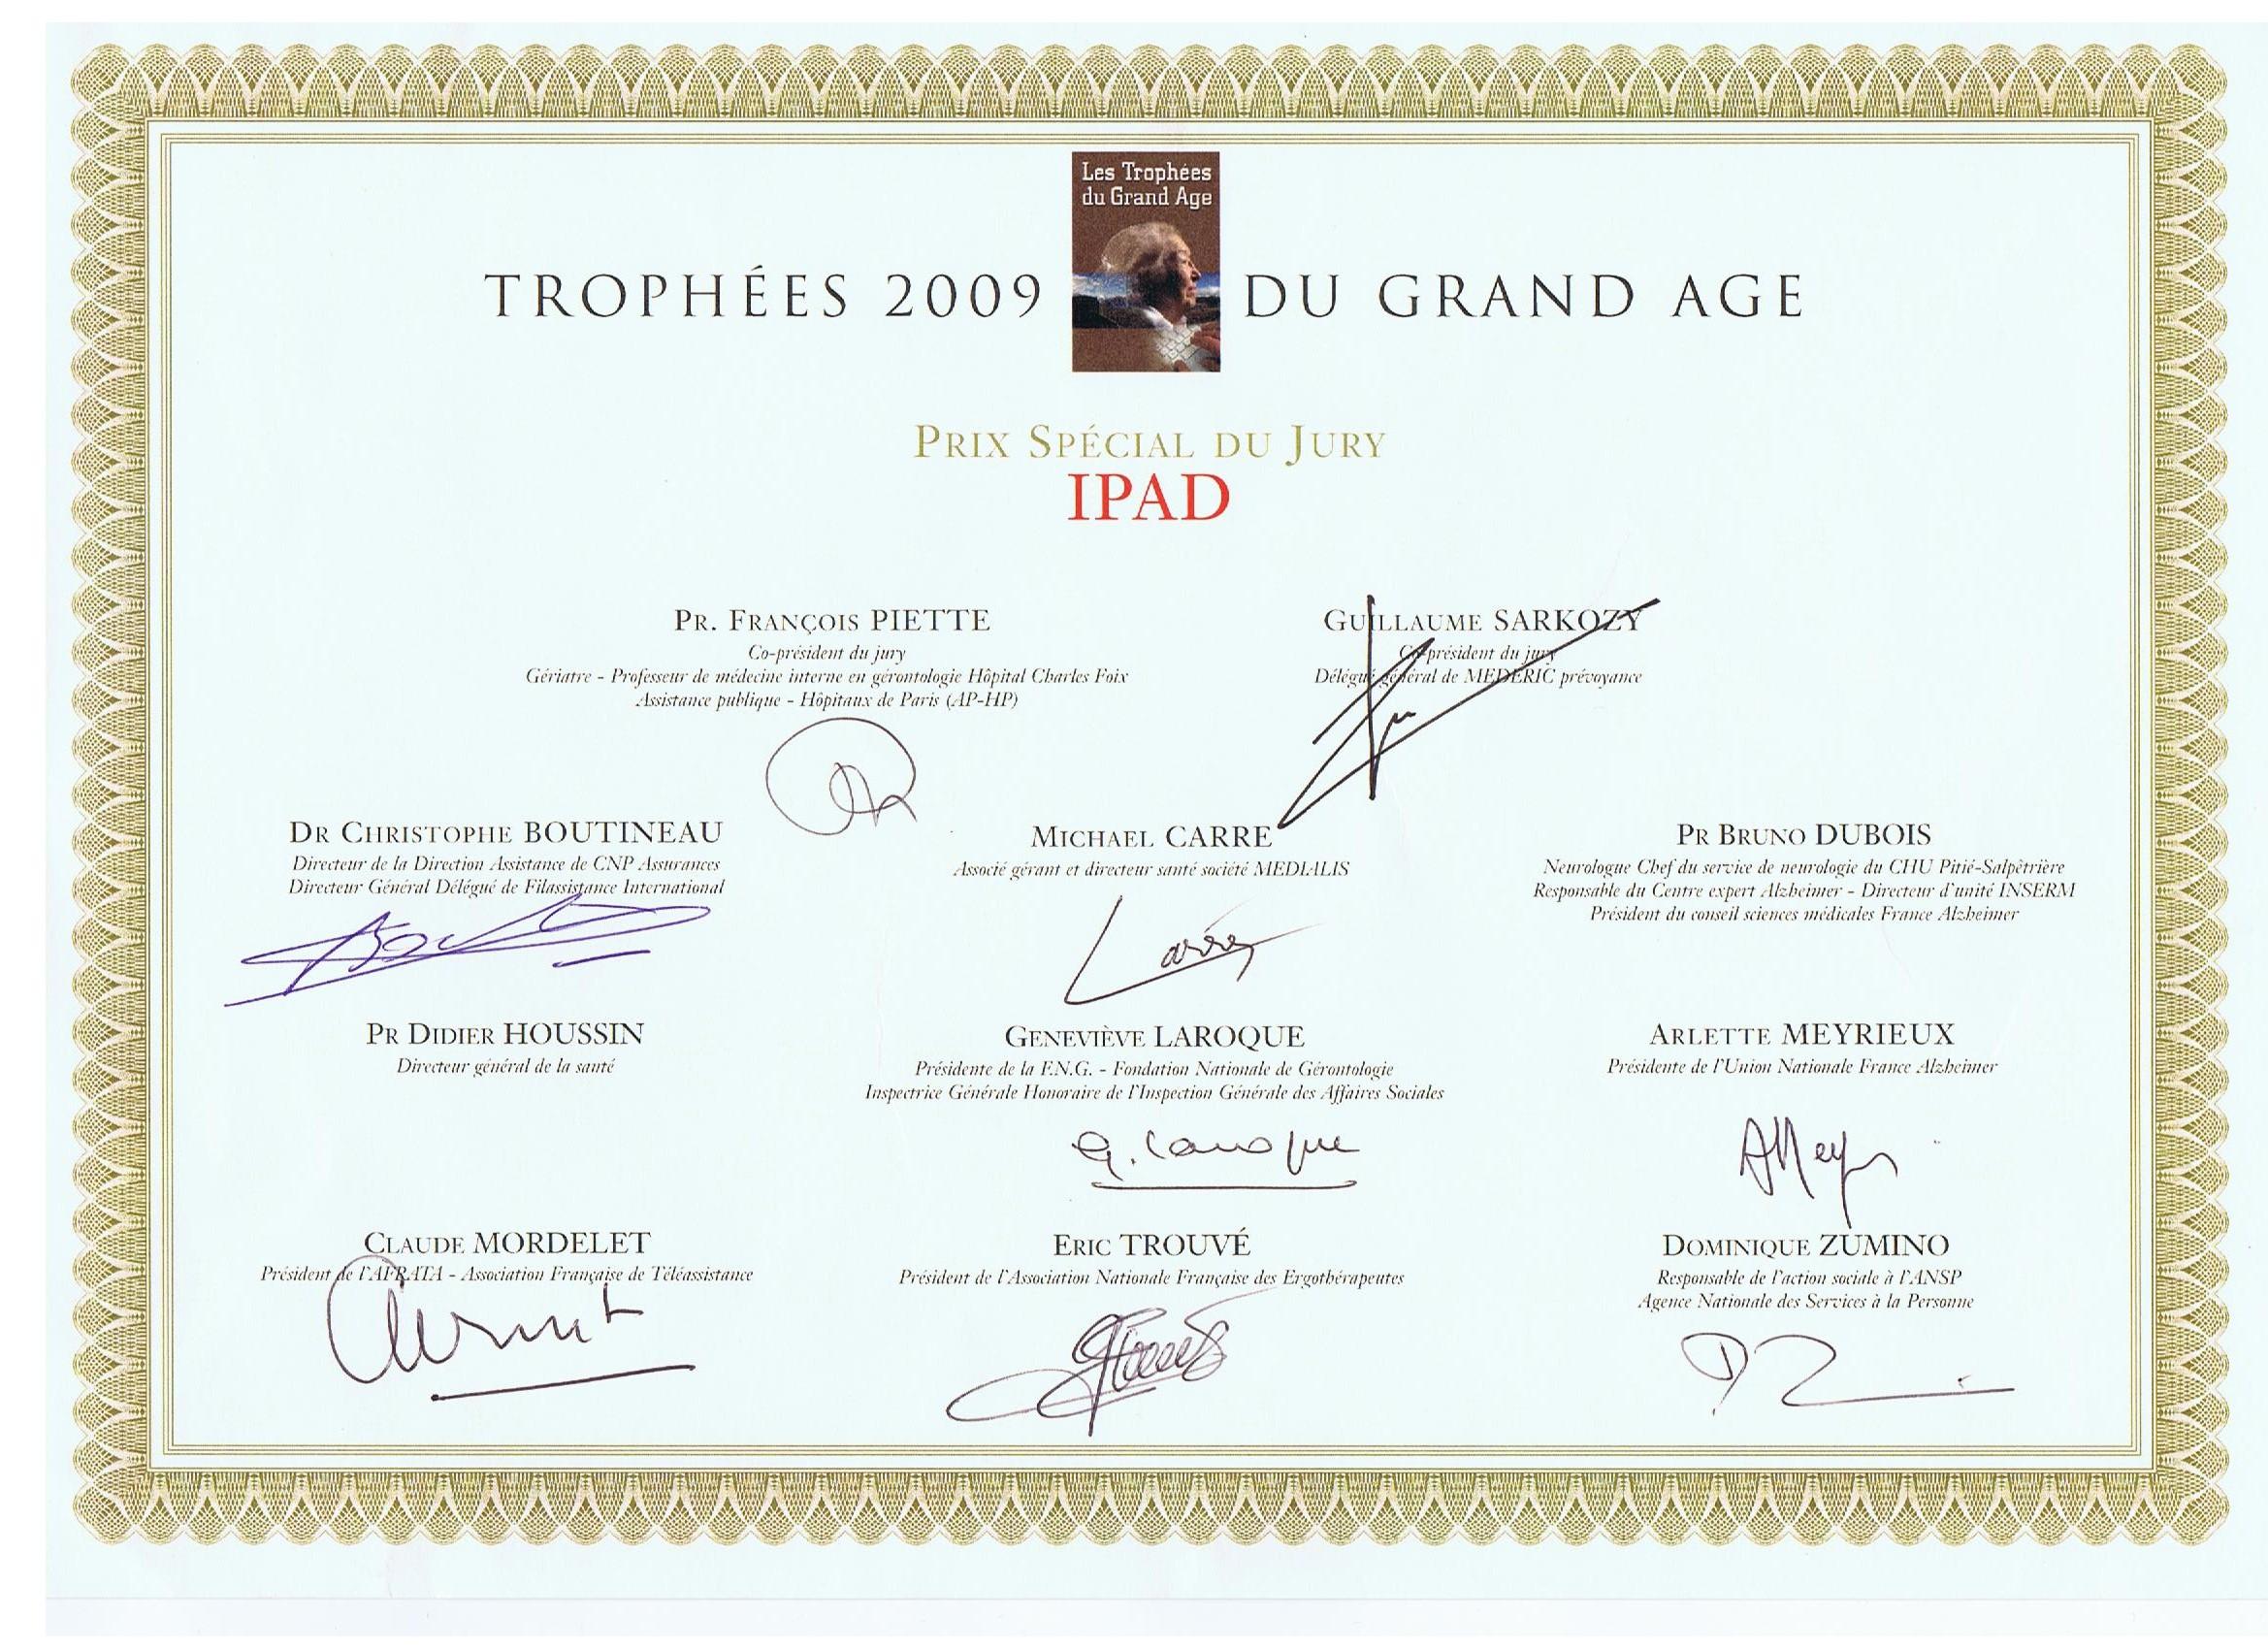 diplôme trophées du grand âge 2009 - IPAD